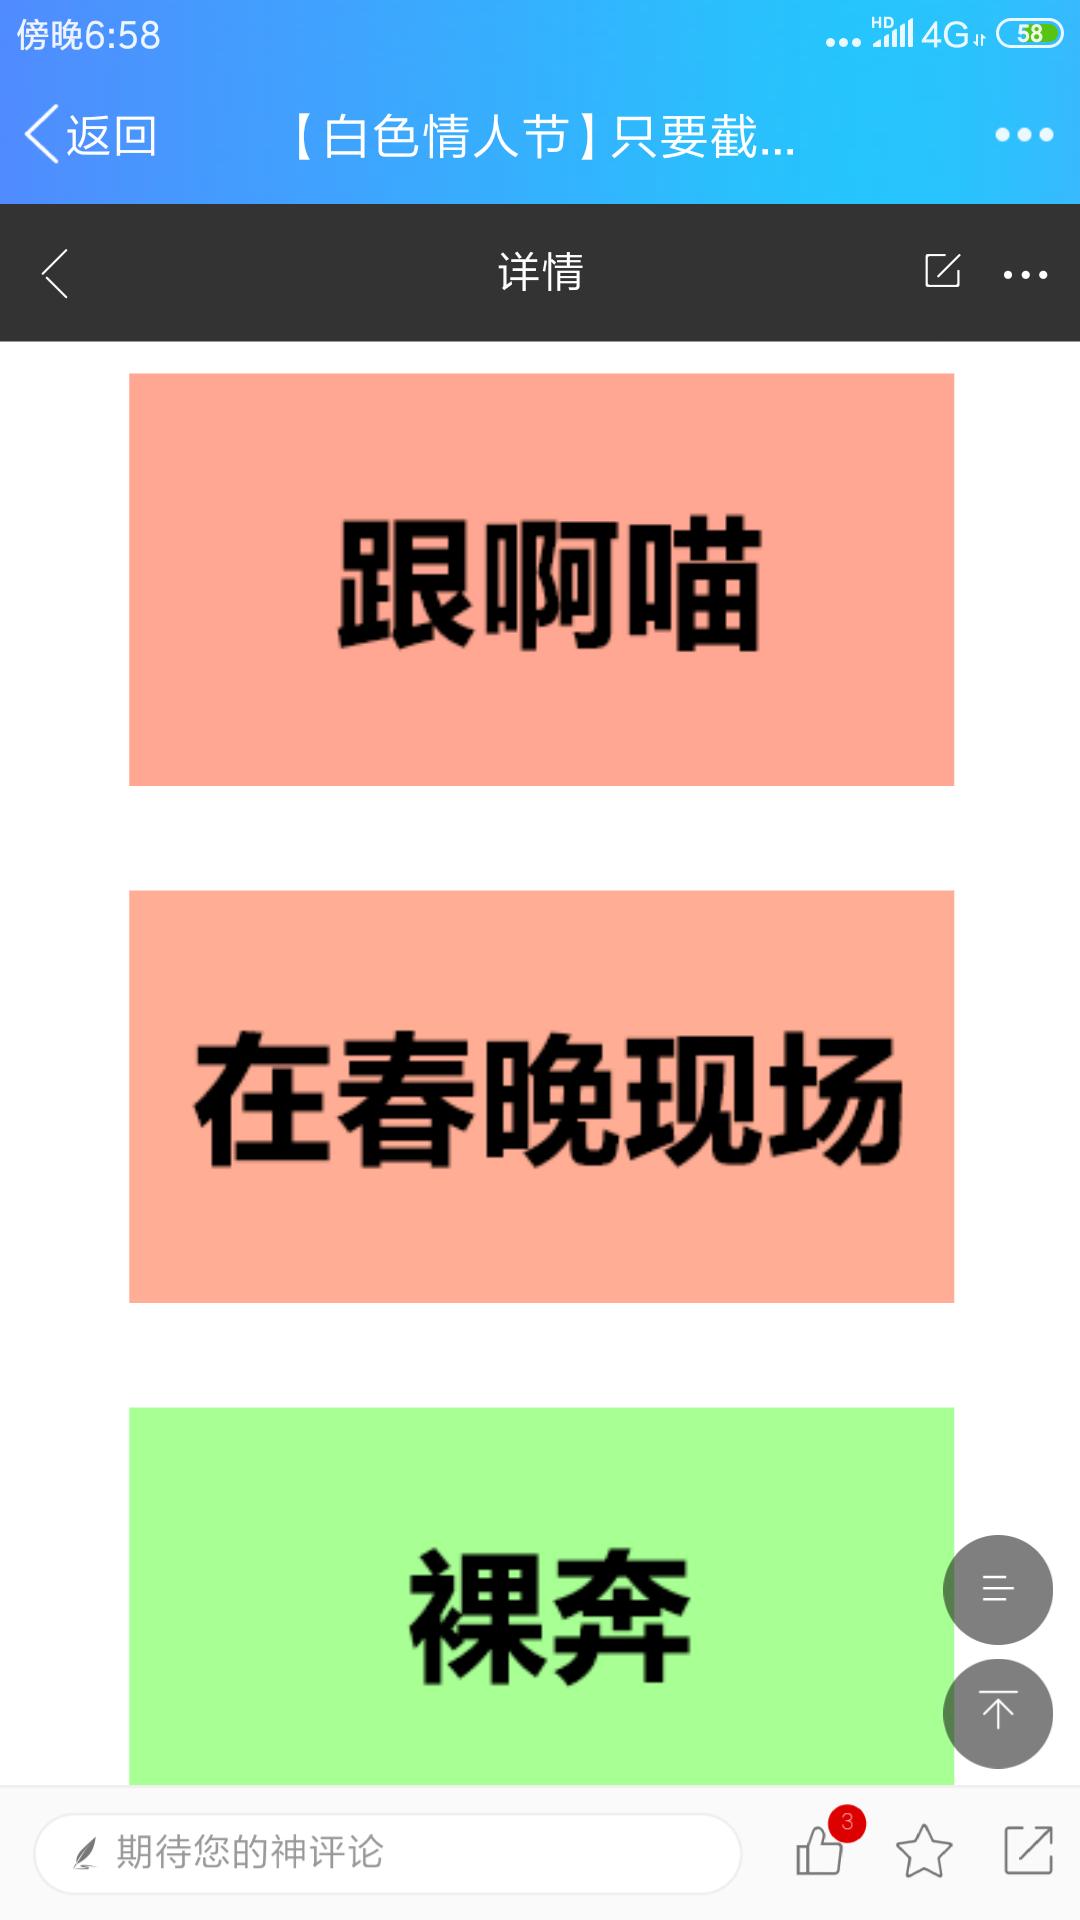 Screenshot_2019-03-13-18-58-24-172_com.tencent.mobileqq.png